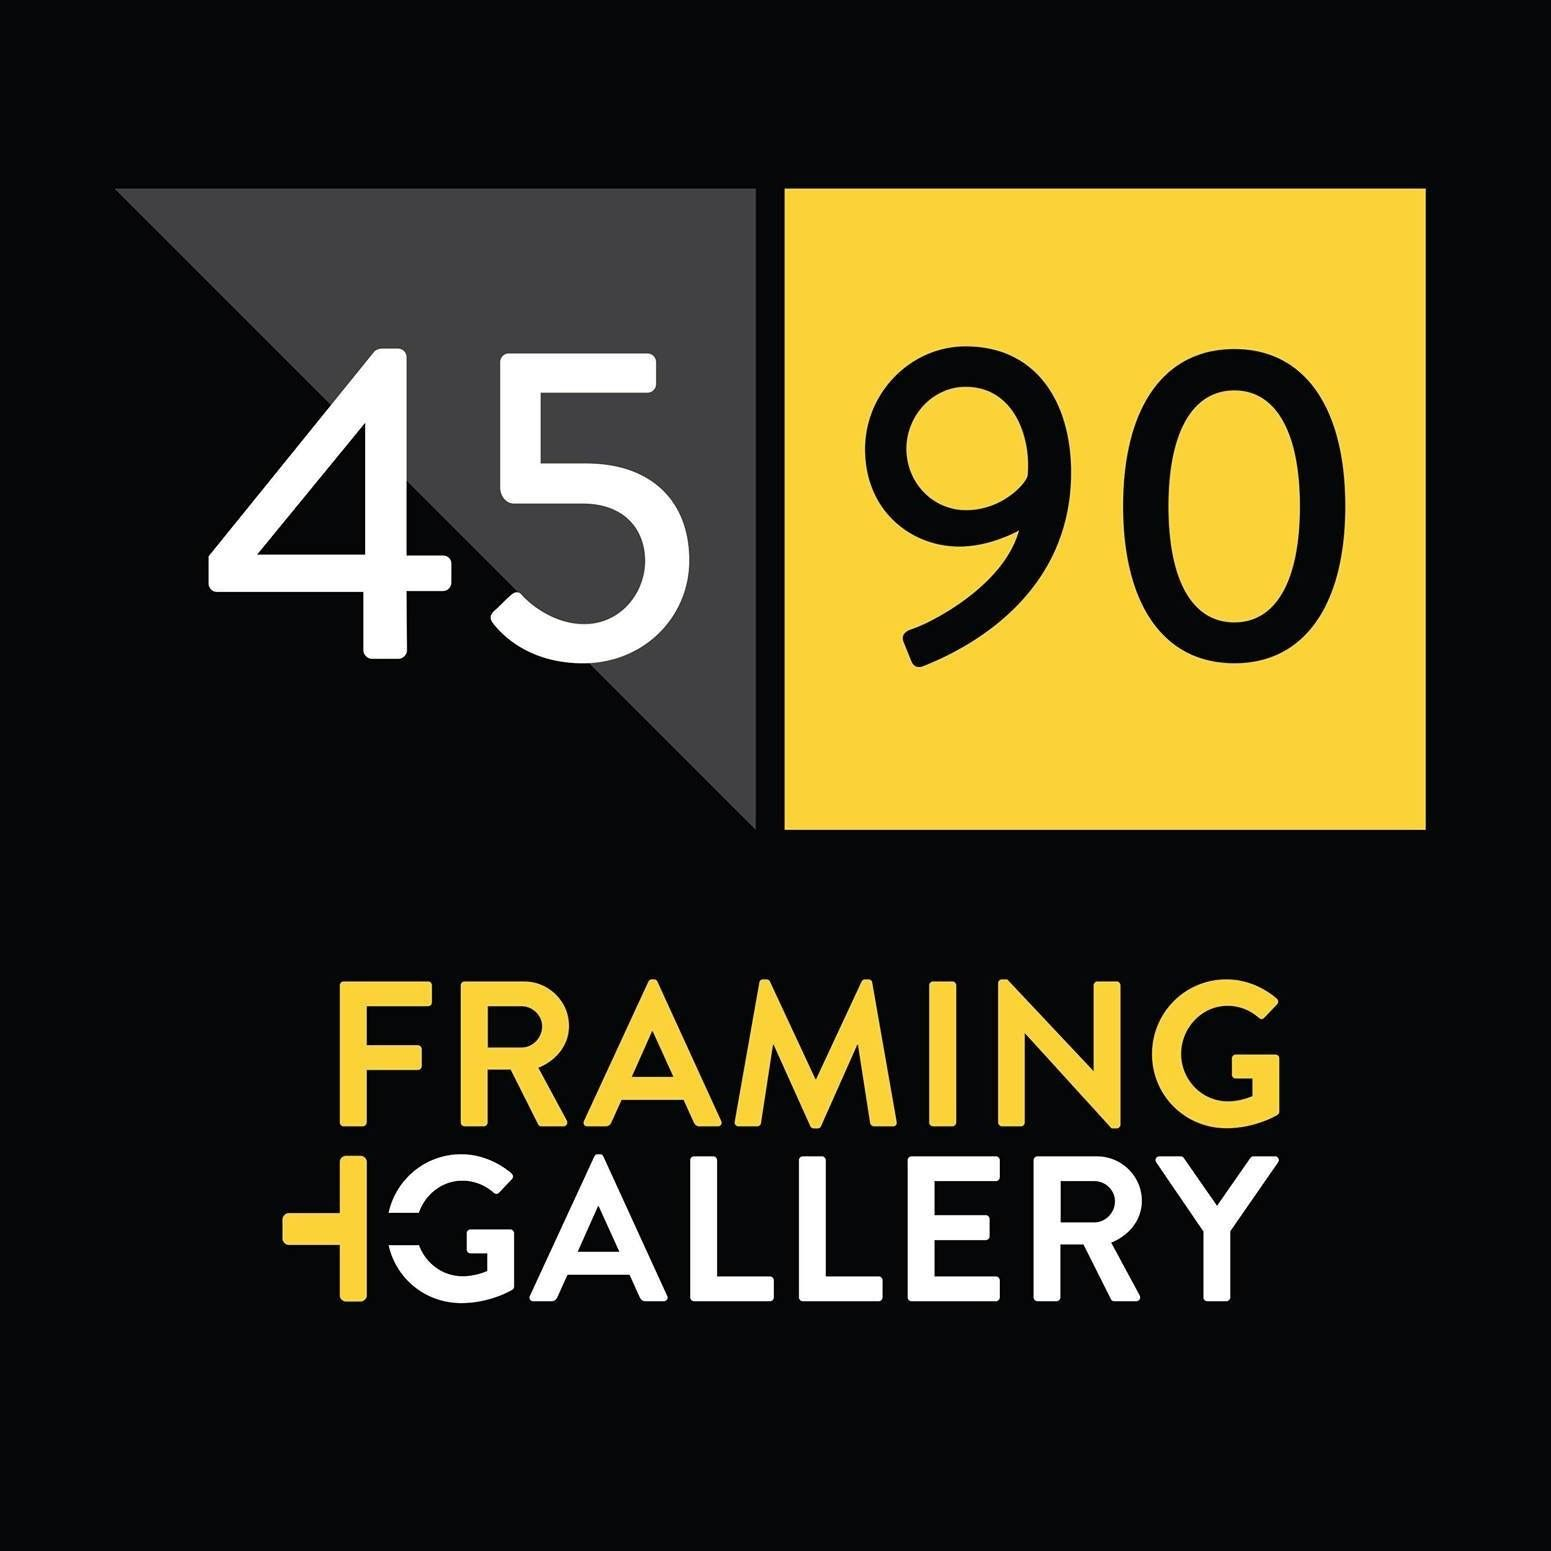 Custom picture framing canberra alongside an art gallery of custom framed lowbrow pop surrealism street art prints